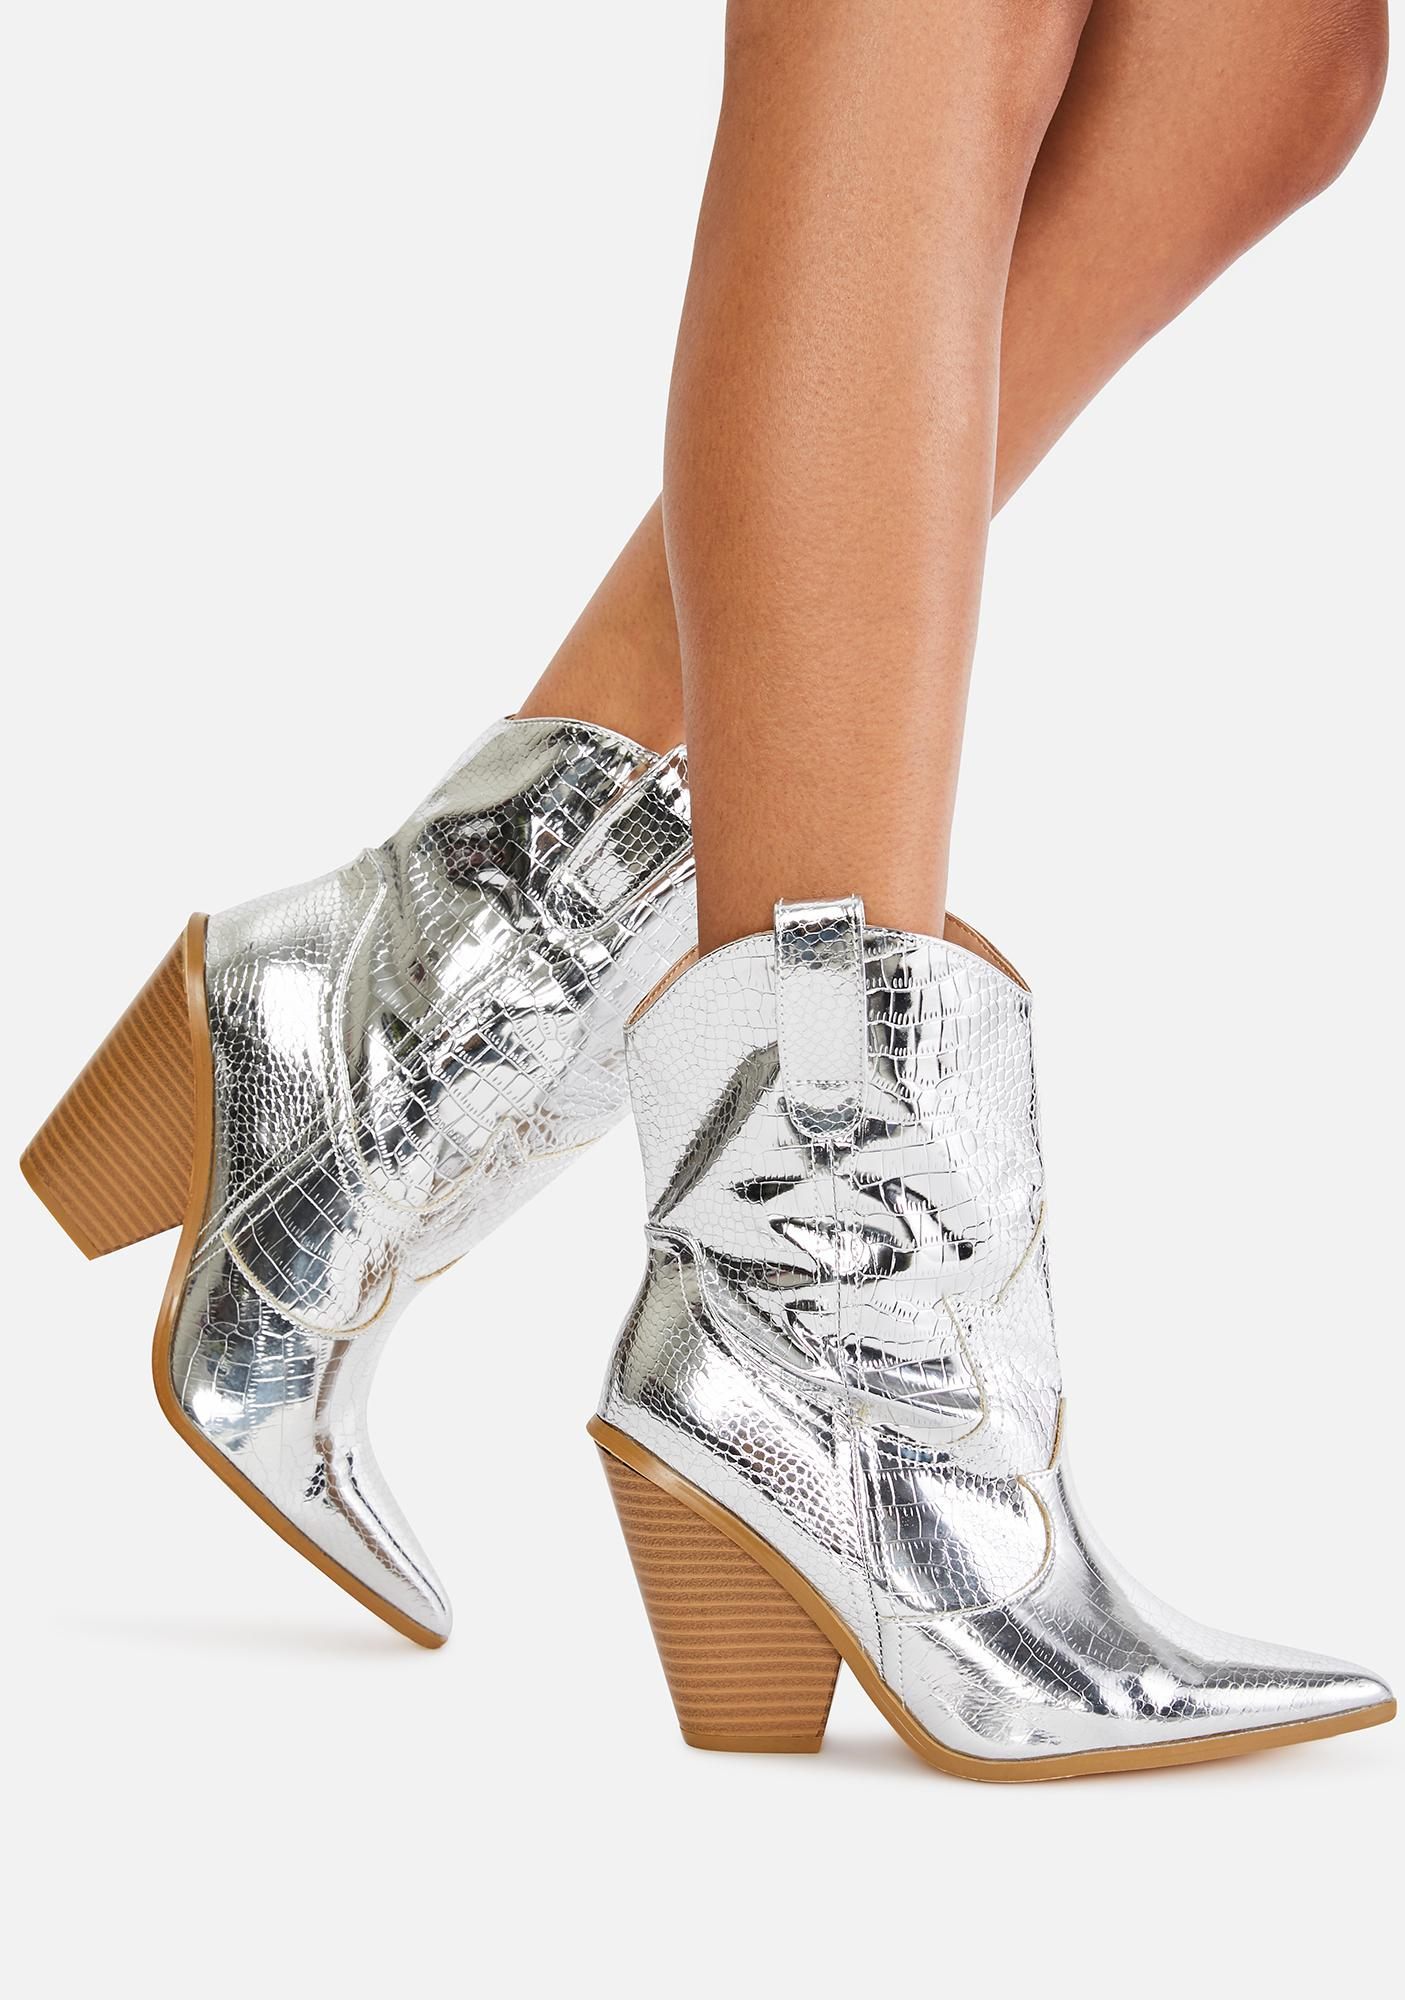 Chrome Walk My Way Cowboy Boots